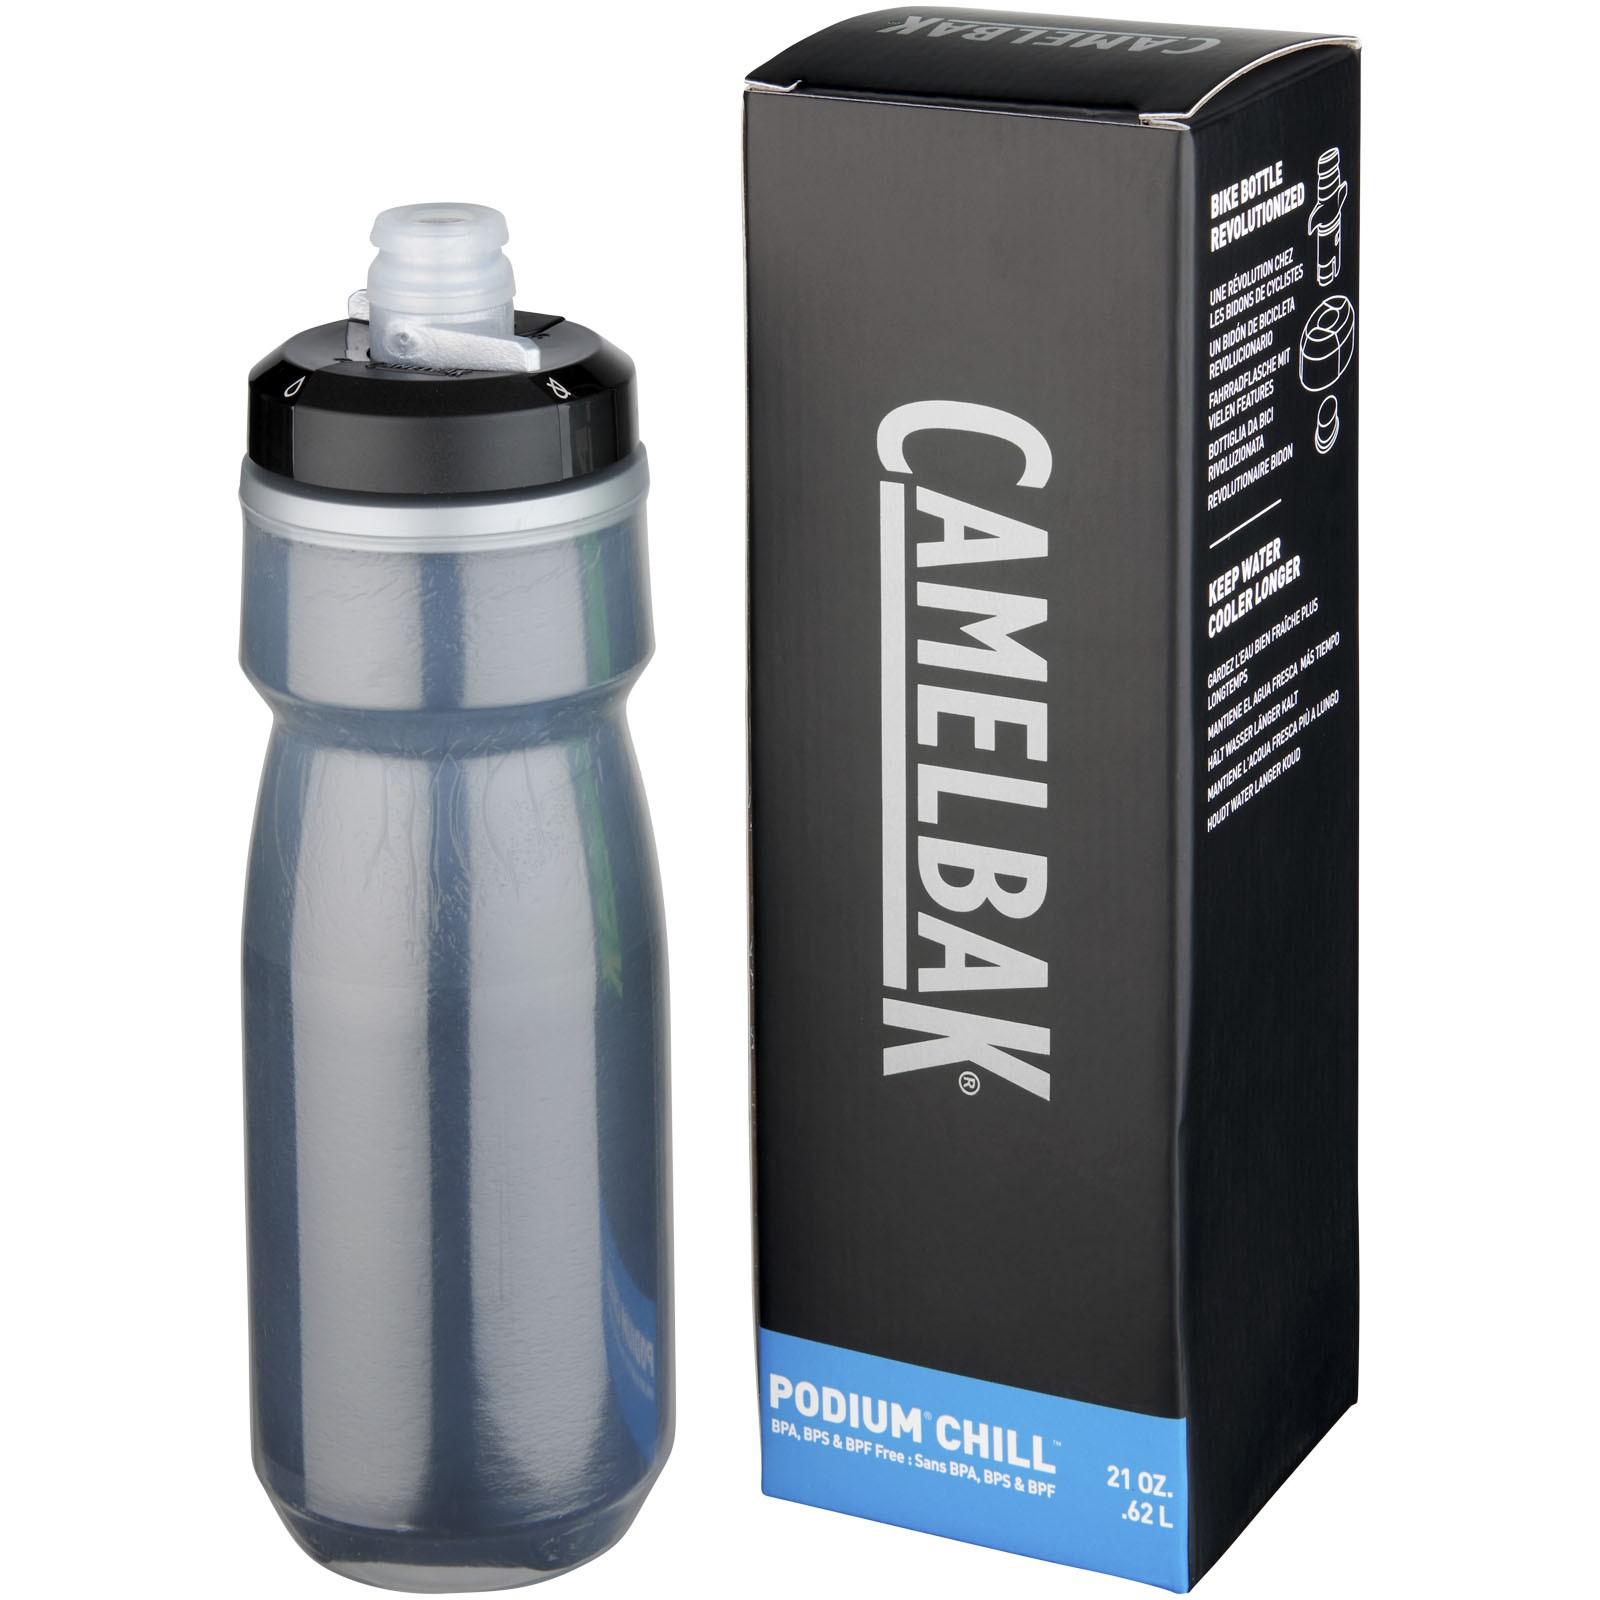 Podium Chill 620 ml sport bottle - Solid black